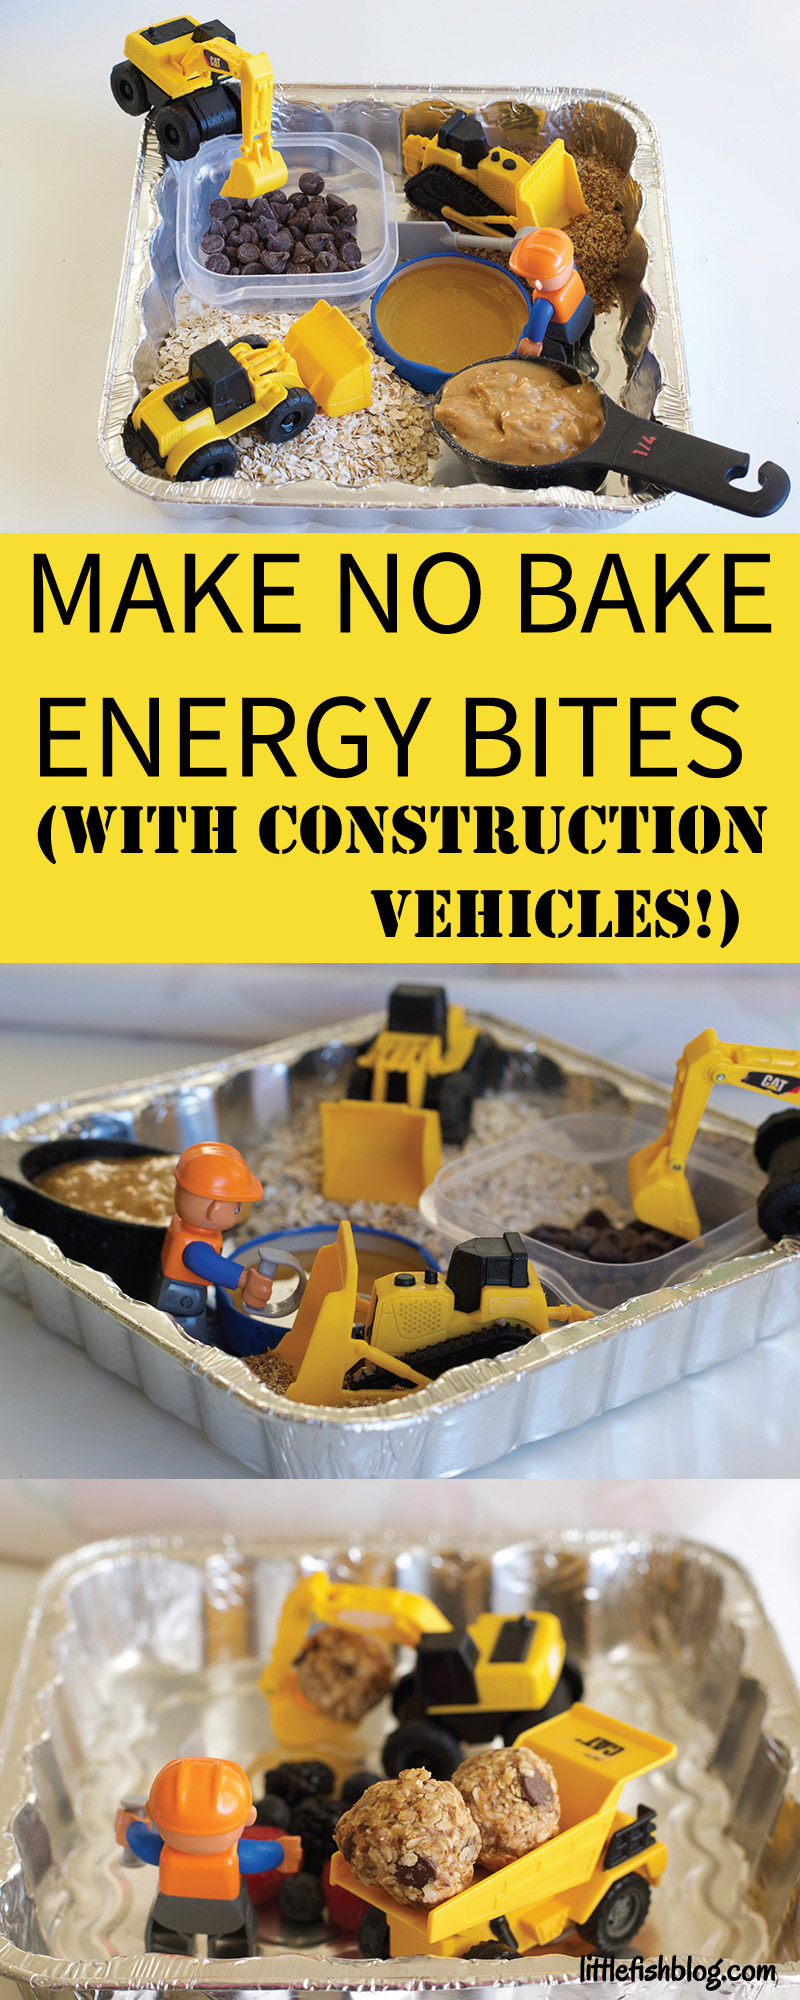 invitation to make no bake energy bites using construction